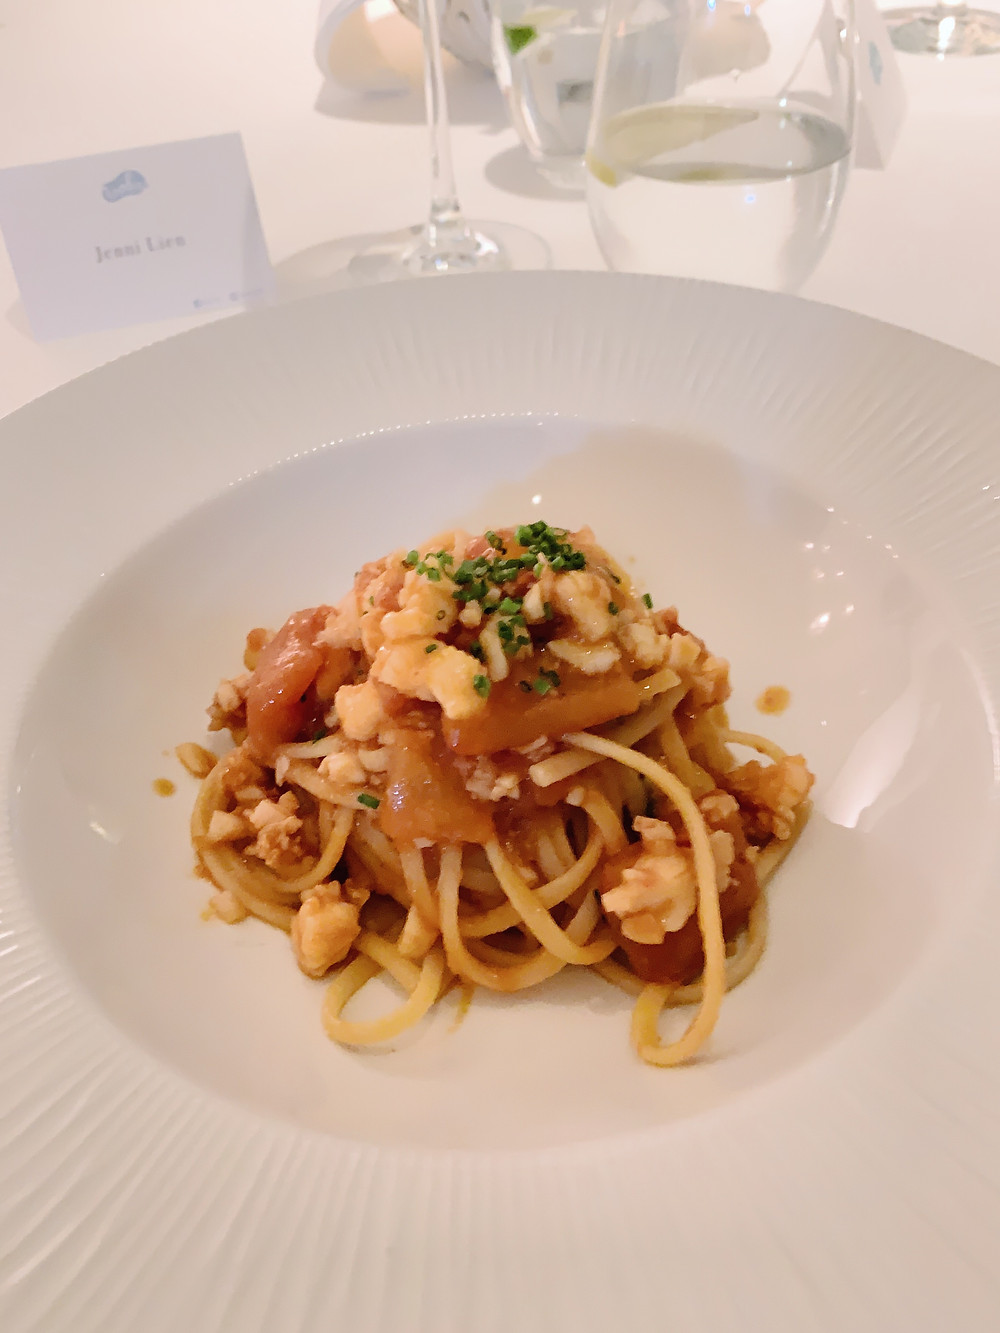 Food at Isola Italian restaurant in Hong Kong